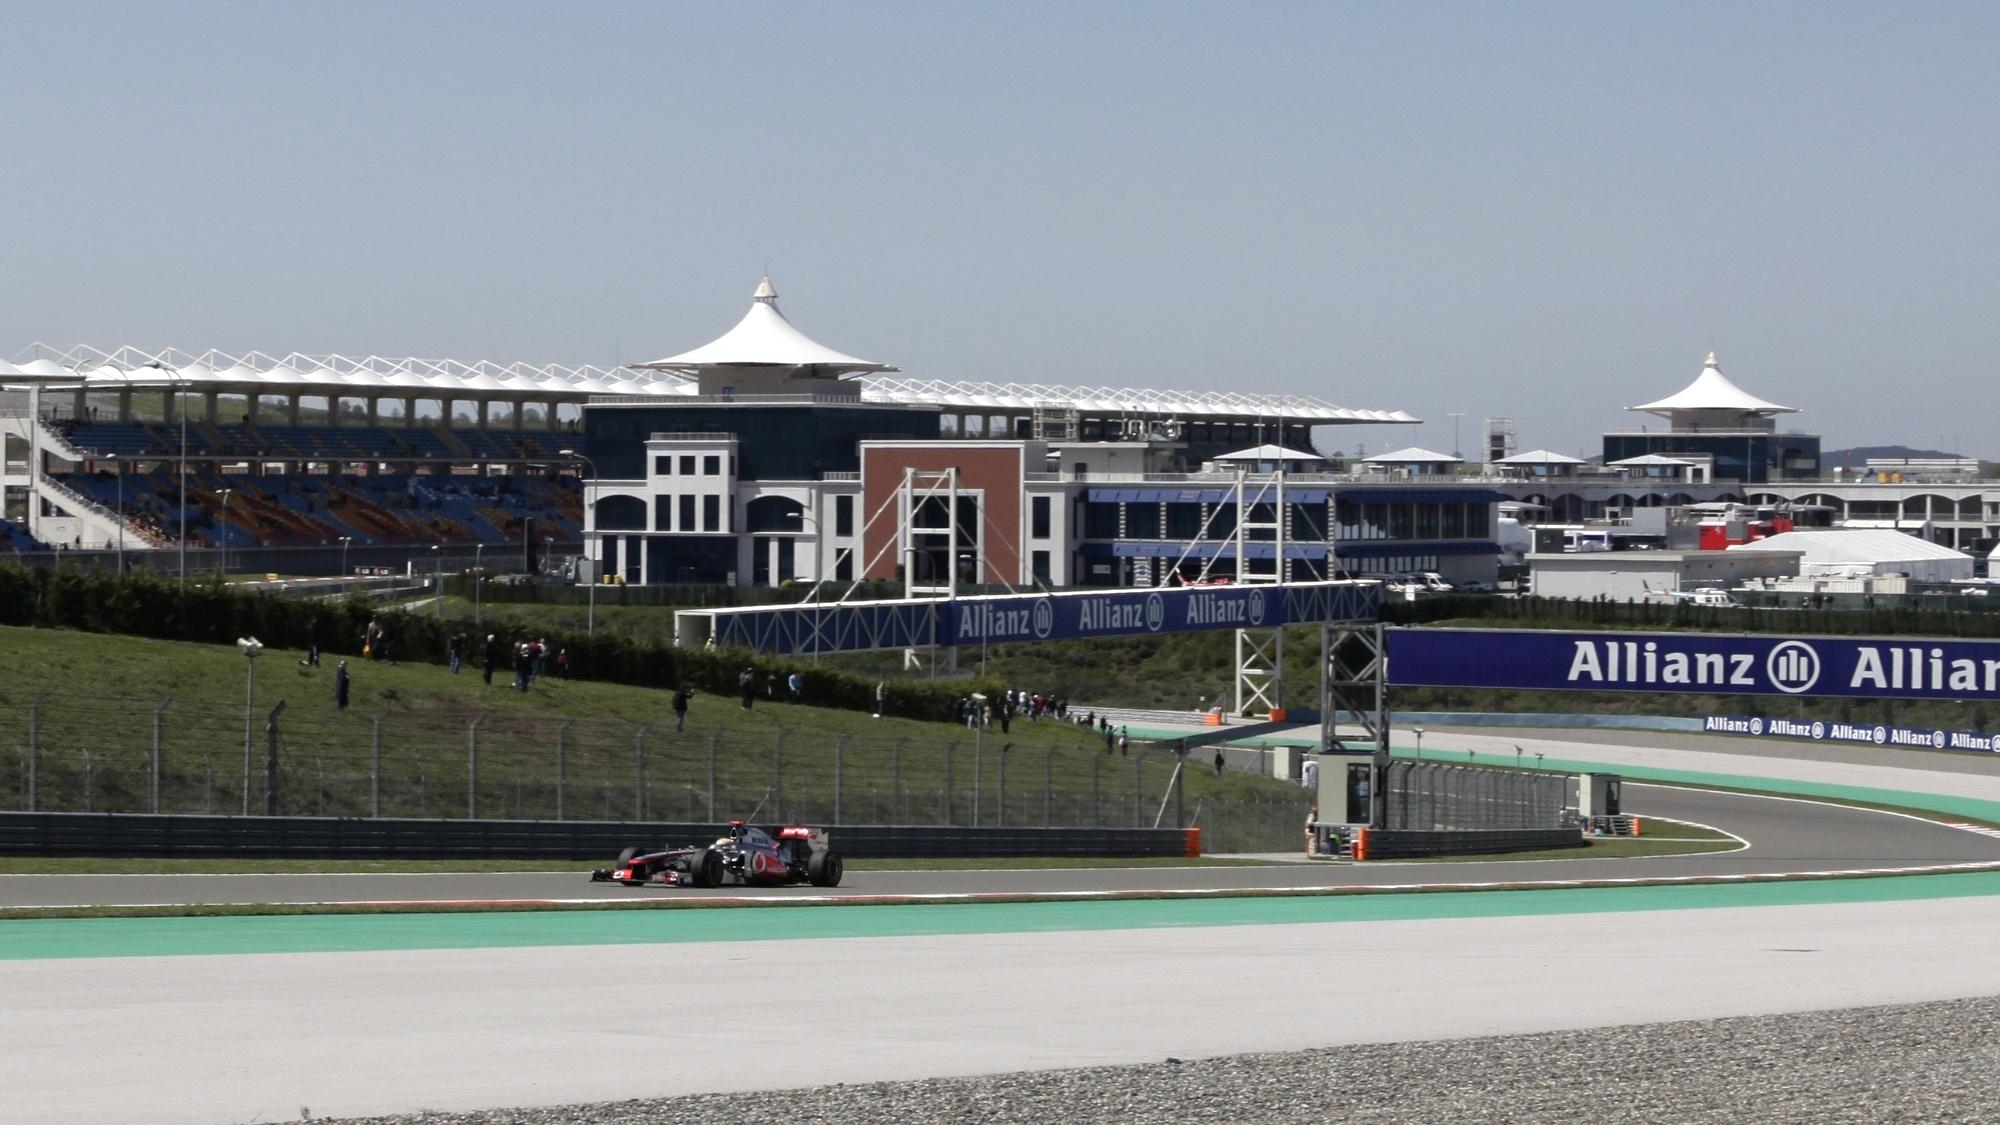 Revised 2020 F1 calendar finalised with Turkish GP return